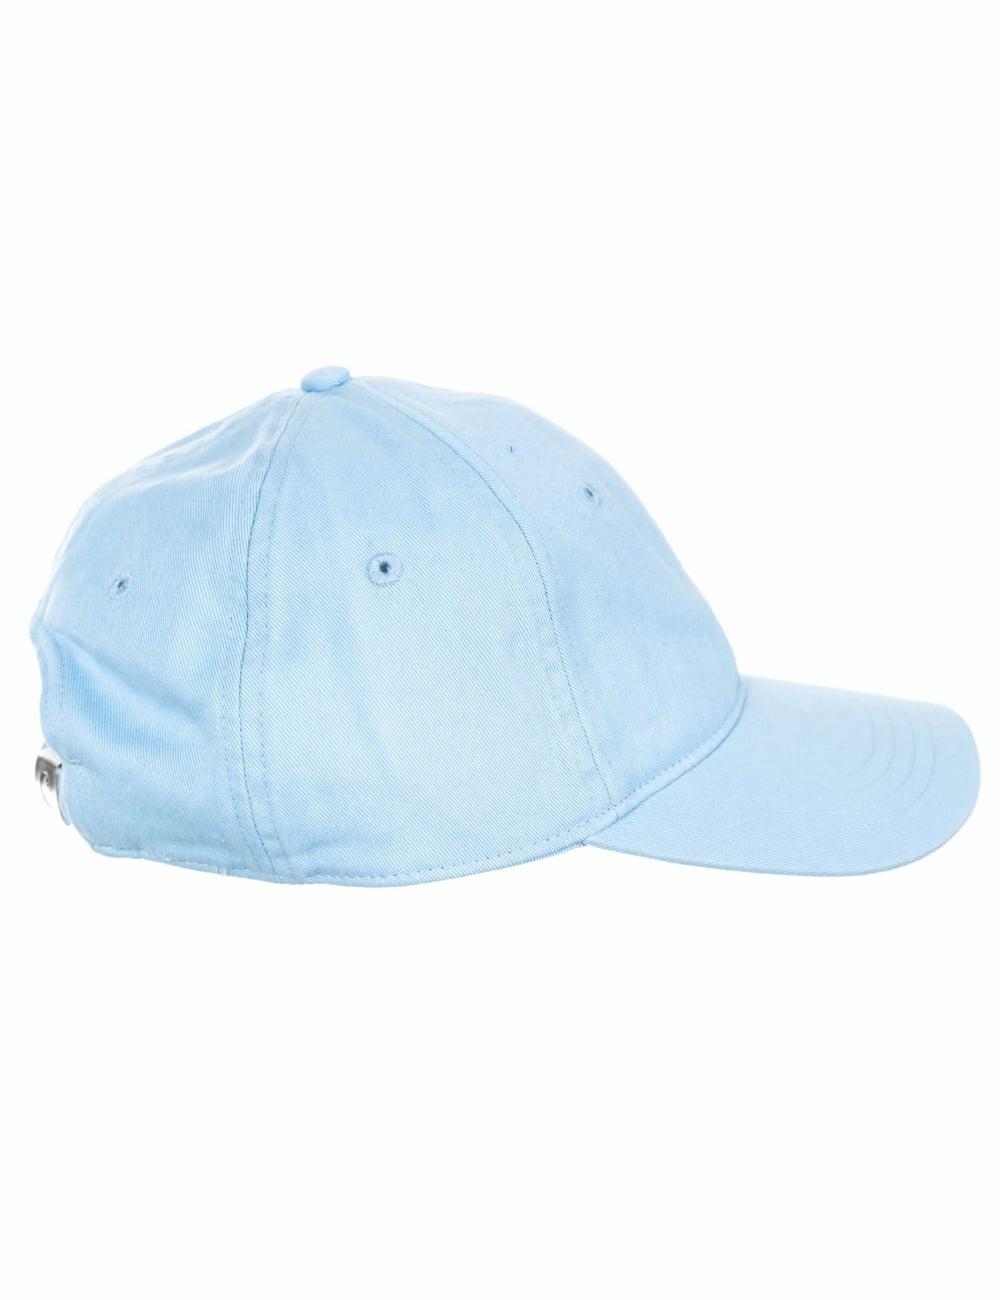 9a810d4fb0c Carhartt WIP Madison Logo Cap - Aquamarine - Accessories from Fat ...